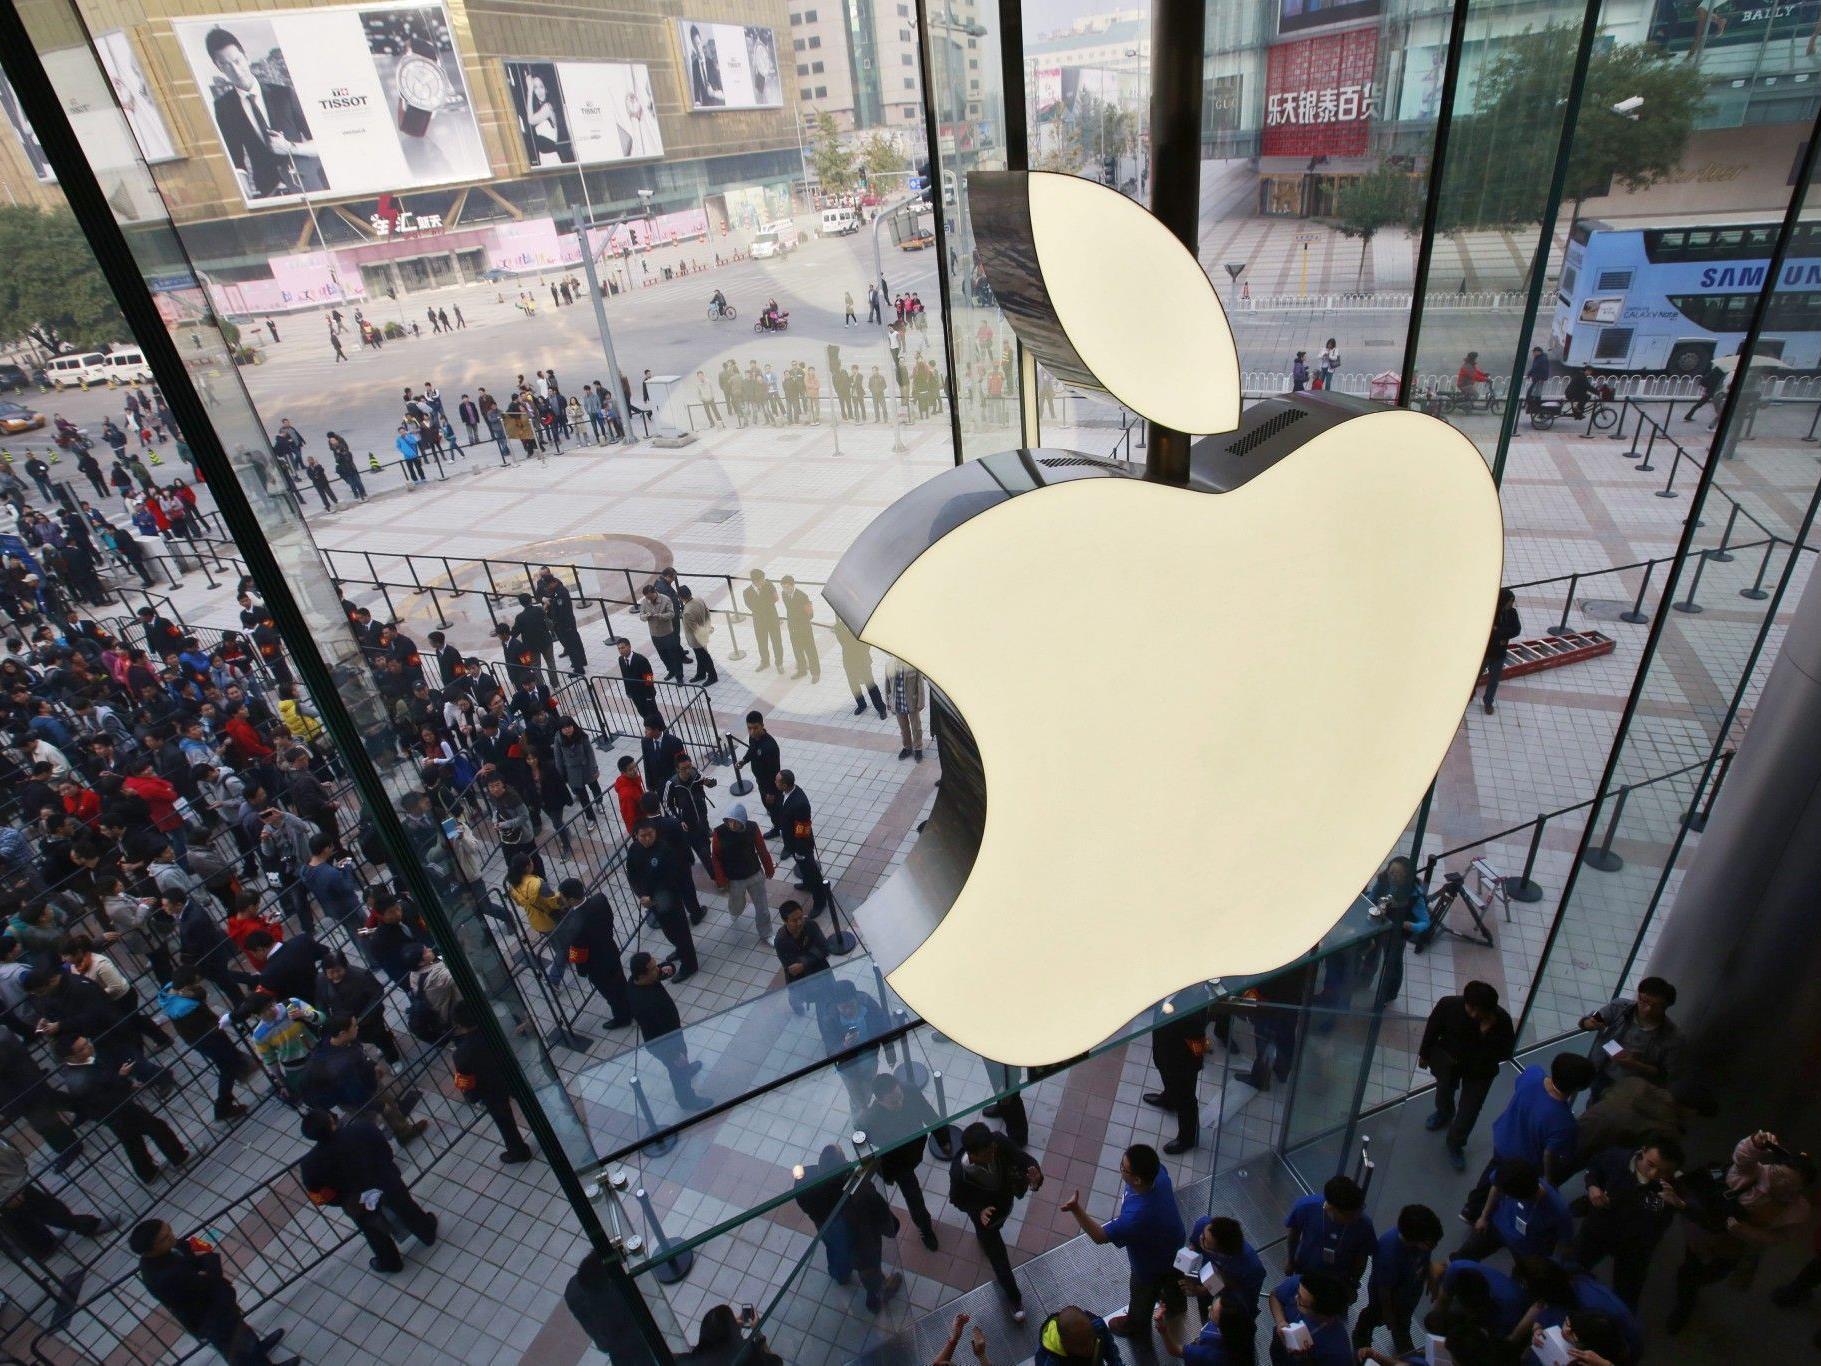 Bild des neuen Apple-Stores in Peking (China).